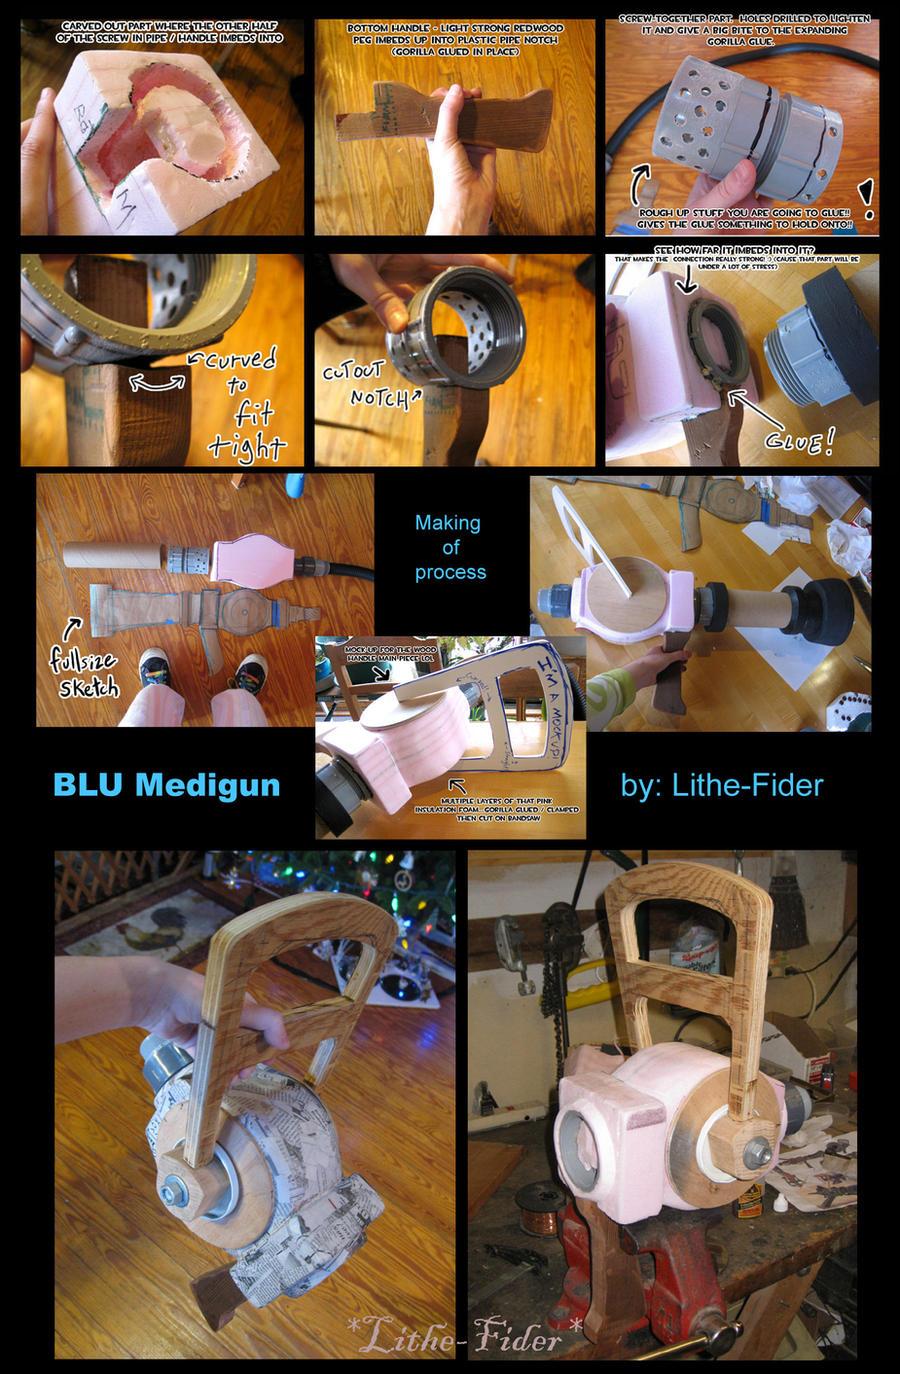 BLU Medic Medigun prop process by Lithe-Fider